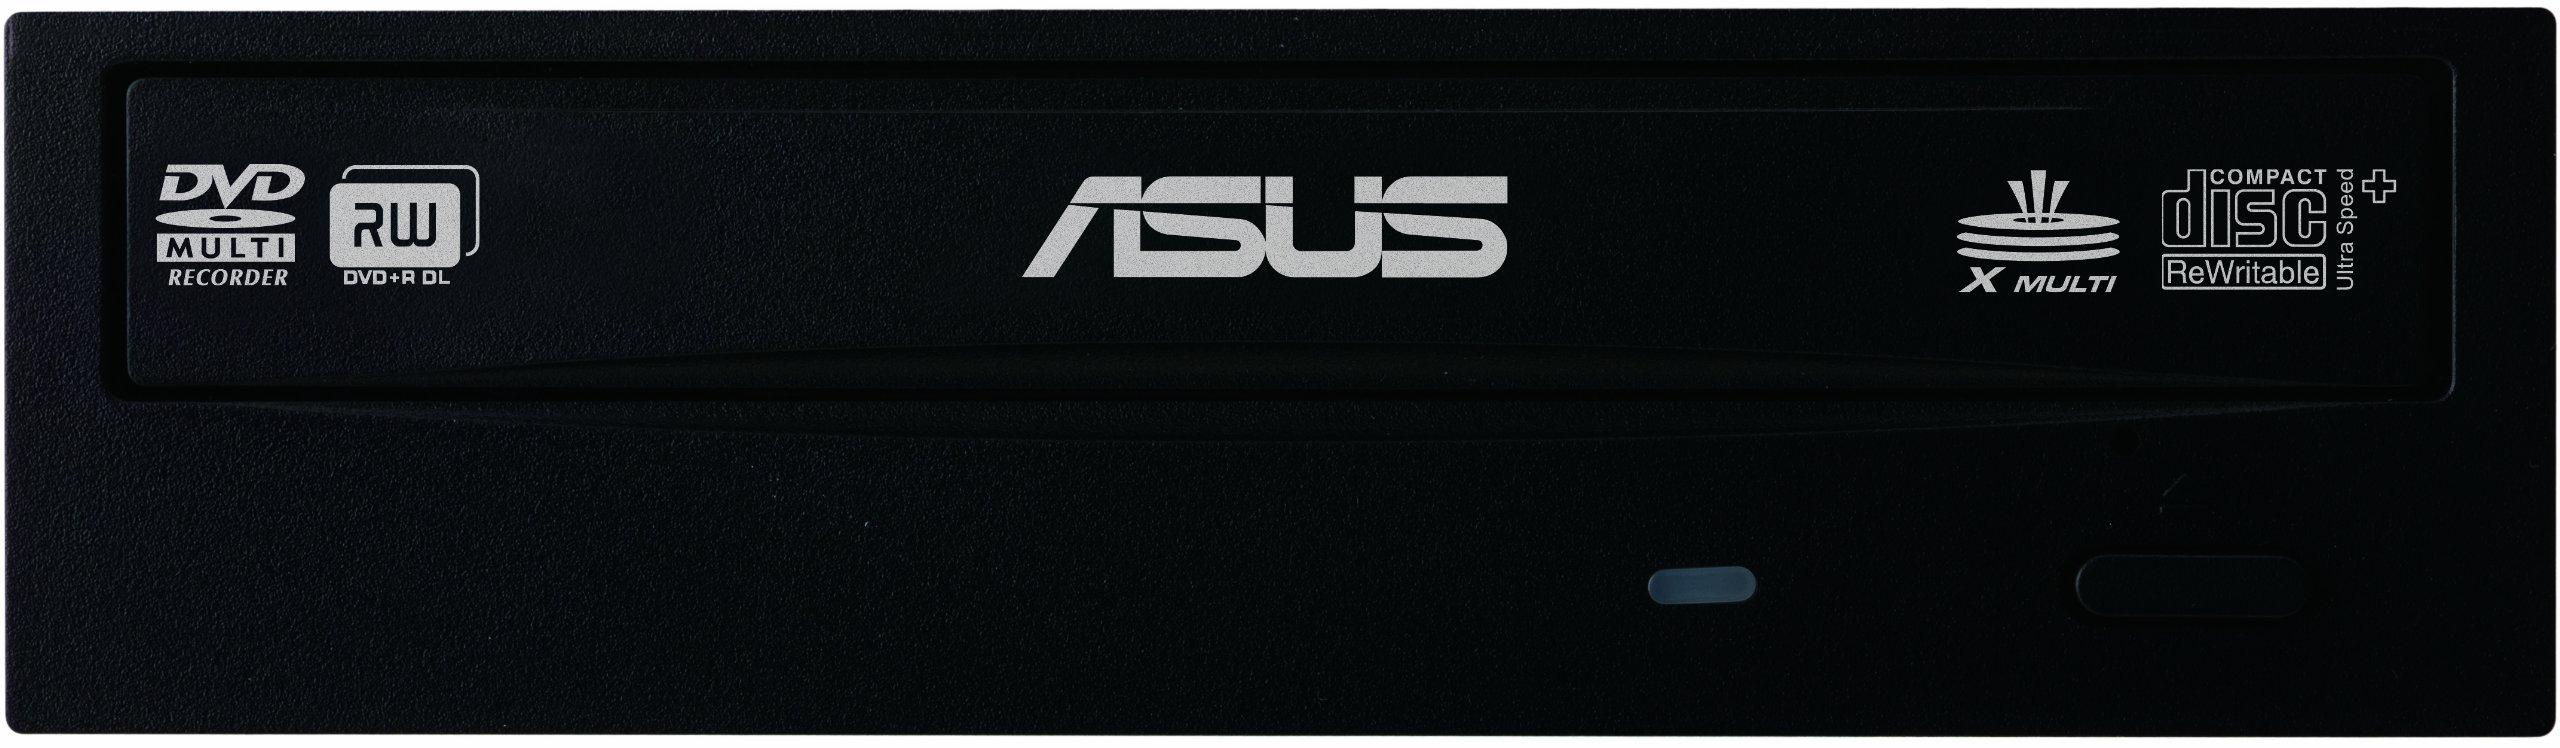 ASUS Internal 24x DVD Rewritable SATA Optical Drive DRW-24B1ST Retail (Black)